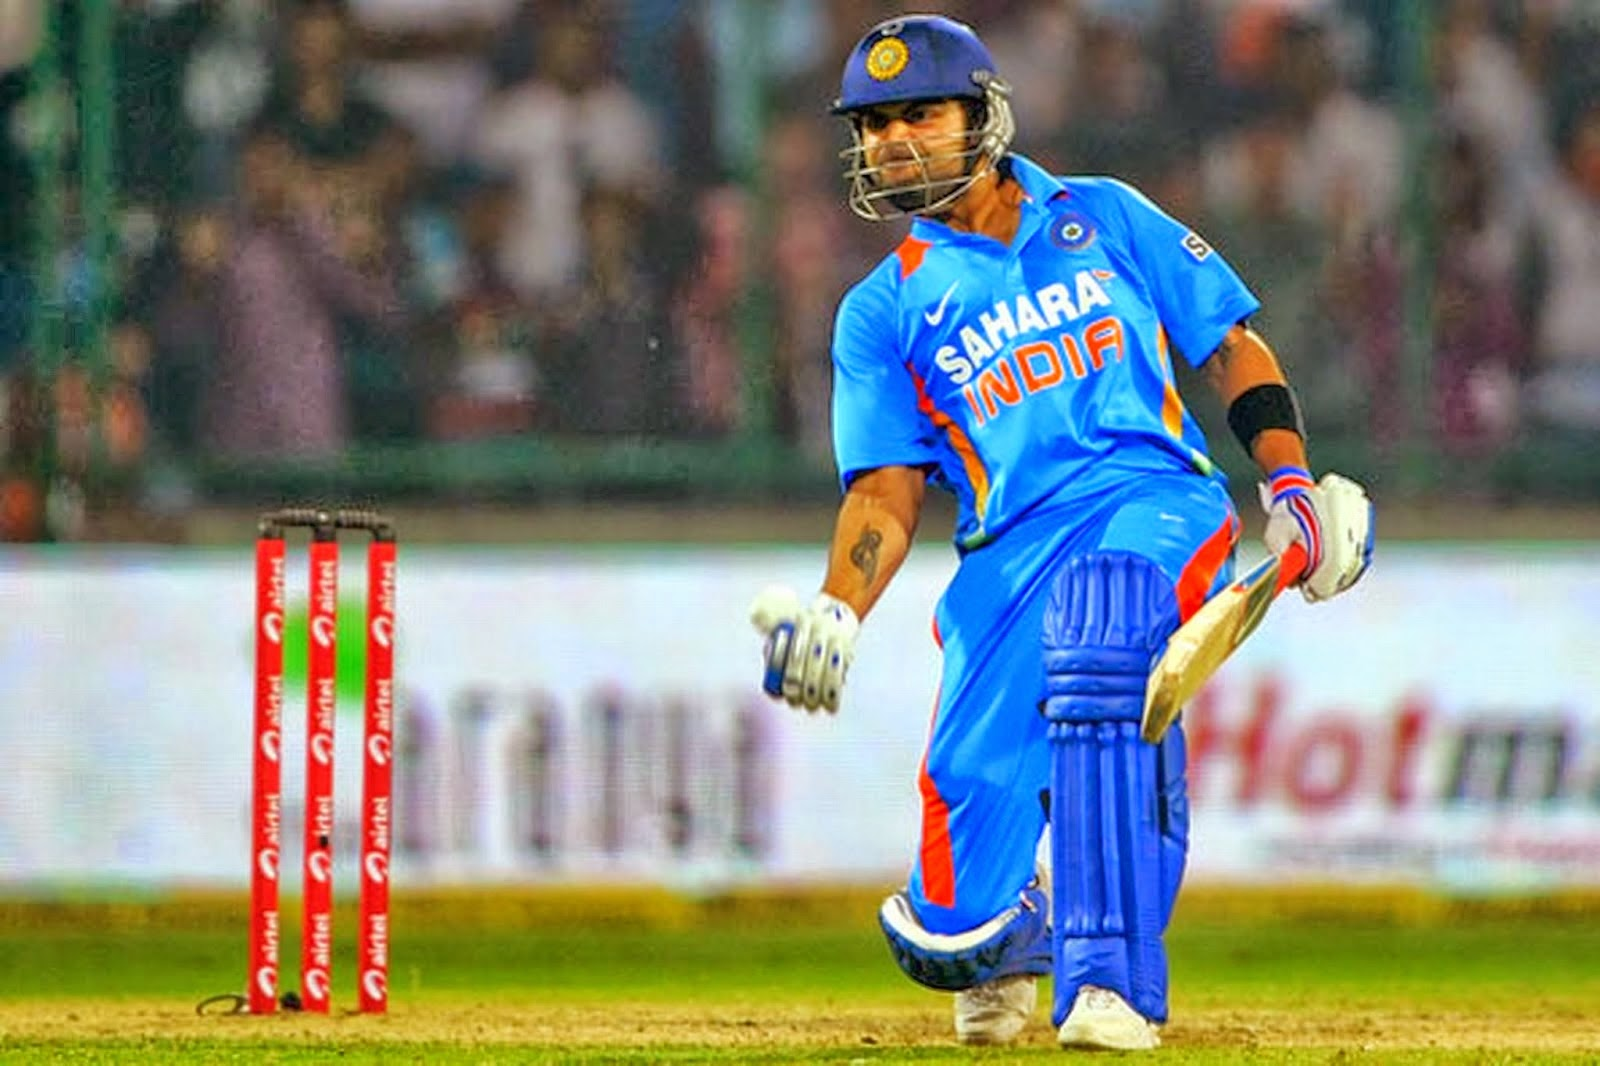 Cricket Stills Wallpapers Virat Kohli Hd Wallpapers Free